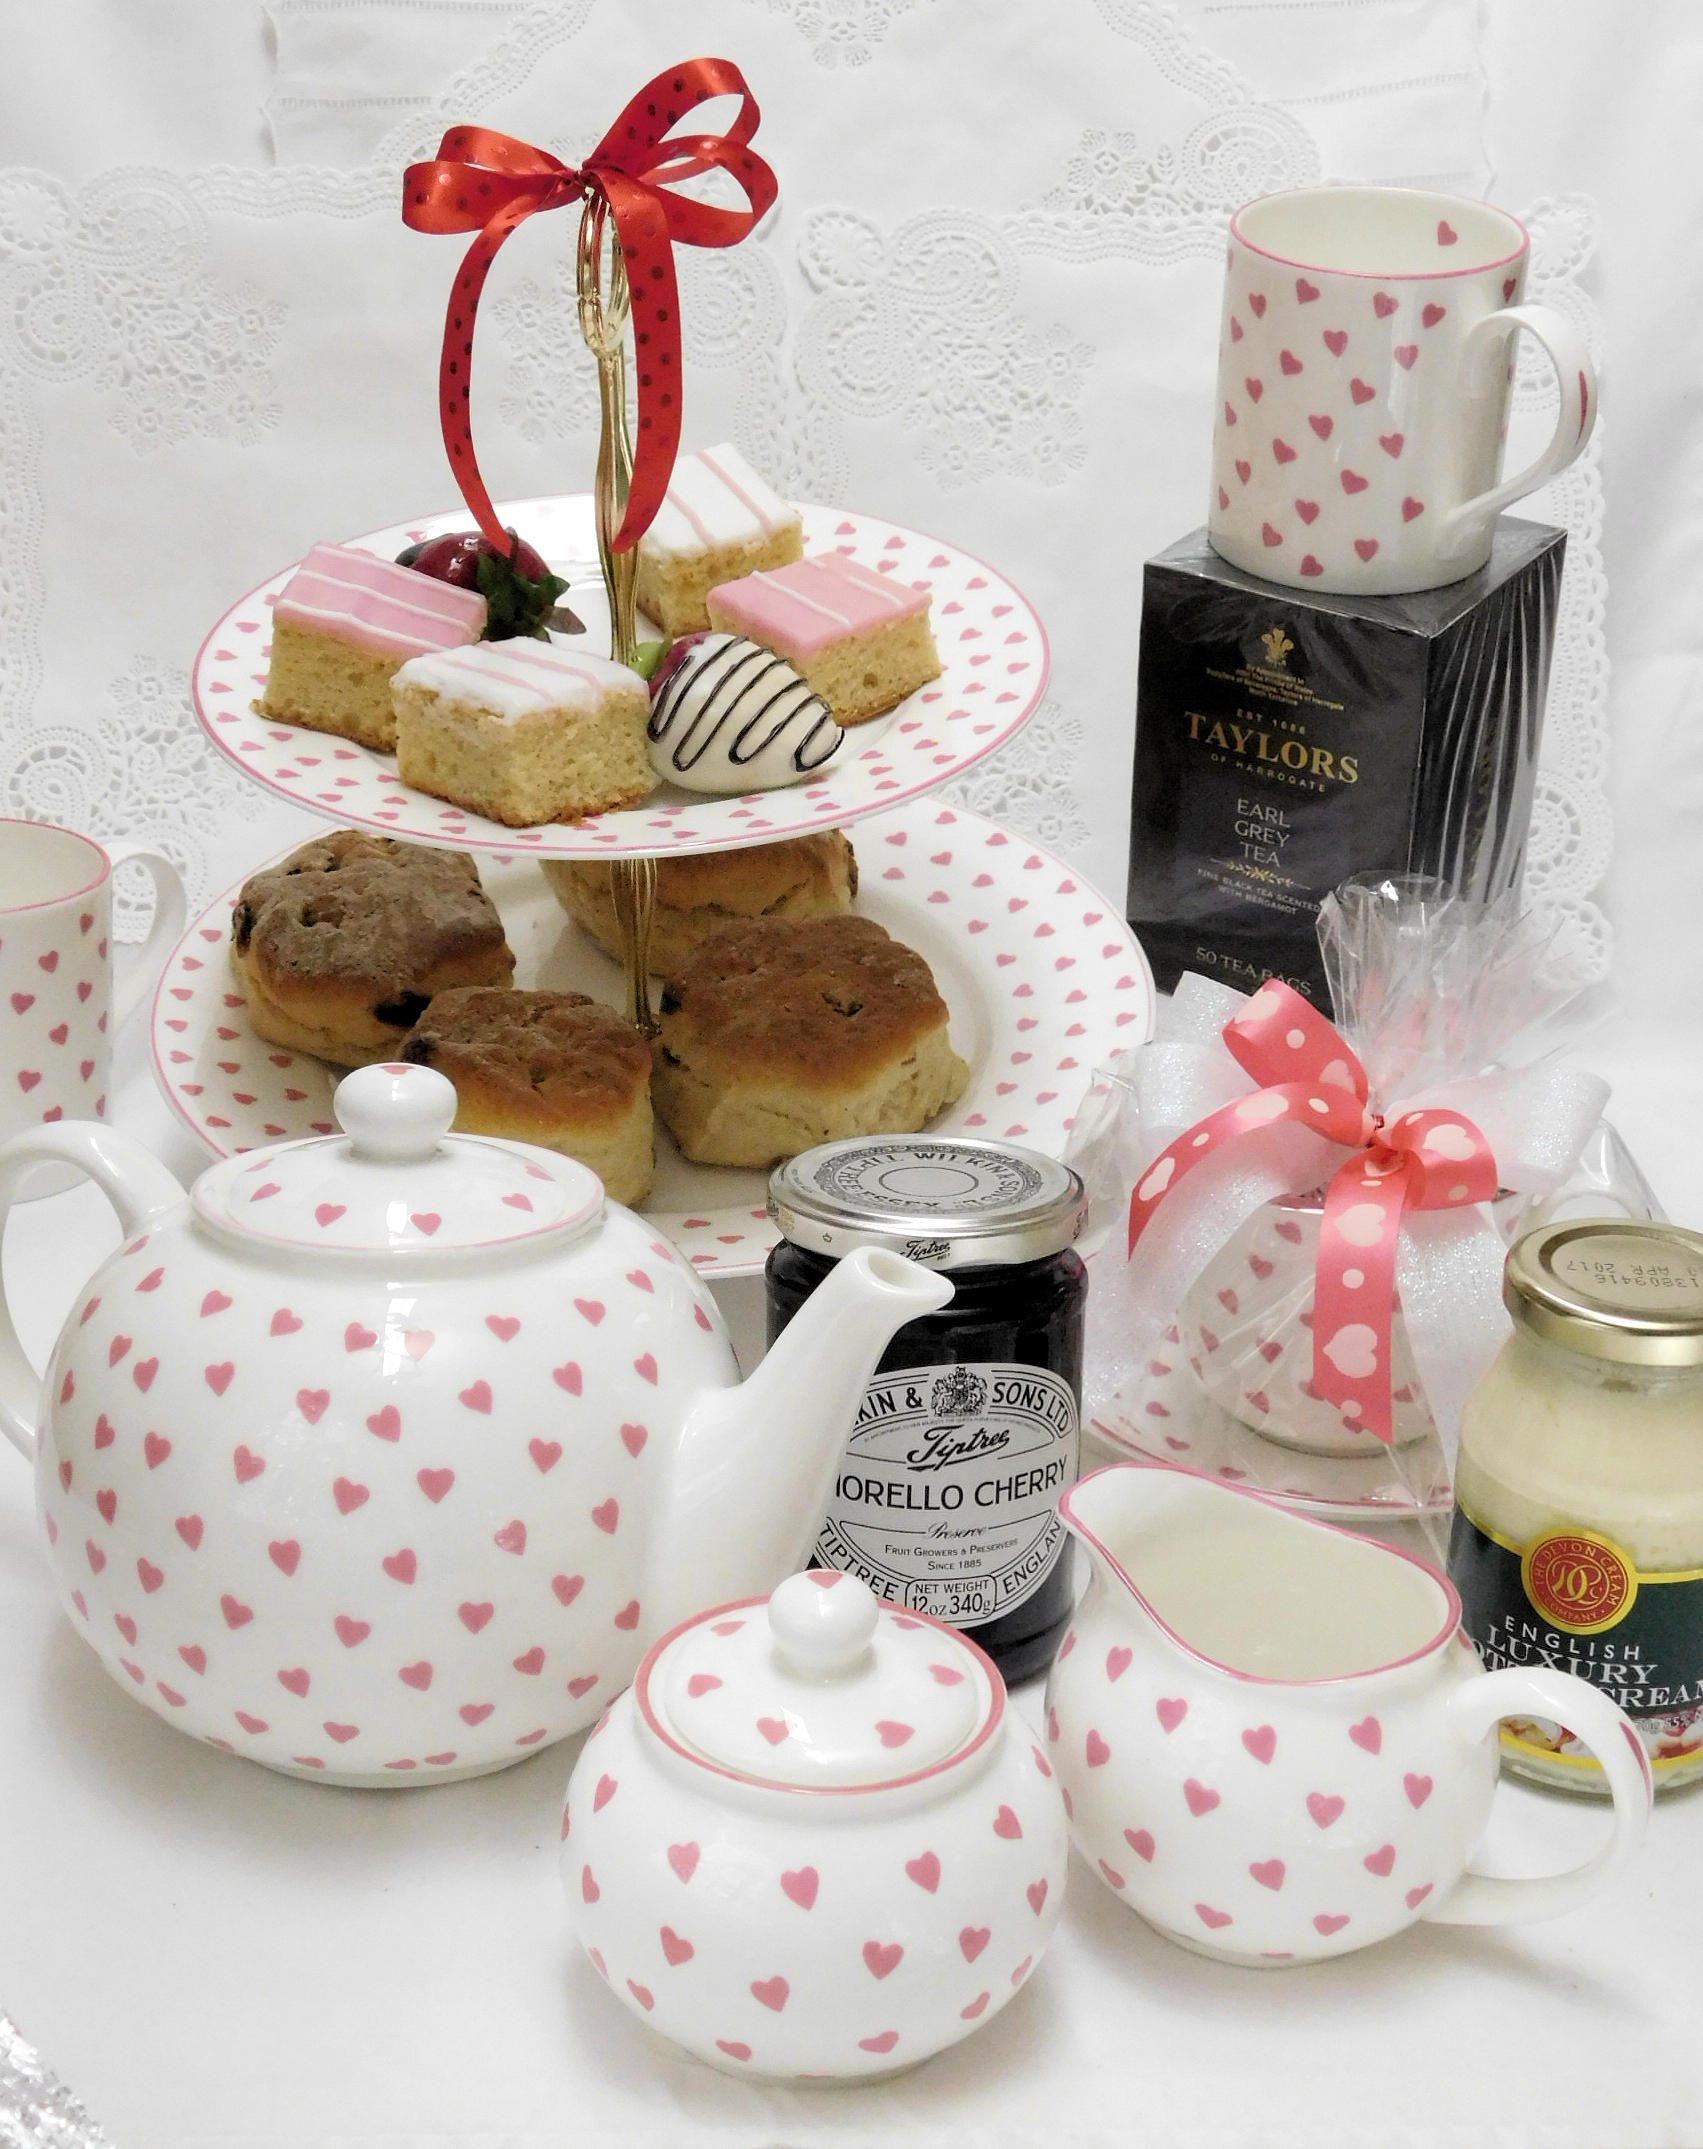 DSCN1761-R afternoon tea Nina Campbell china Goldenberry gourmet.jpg